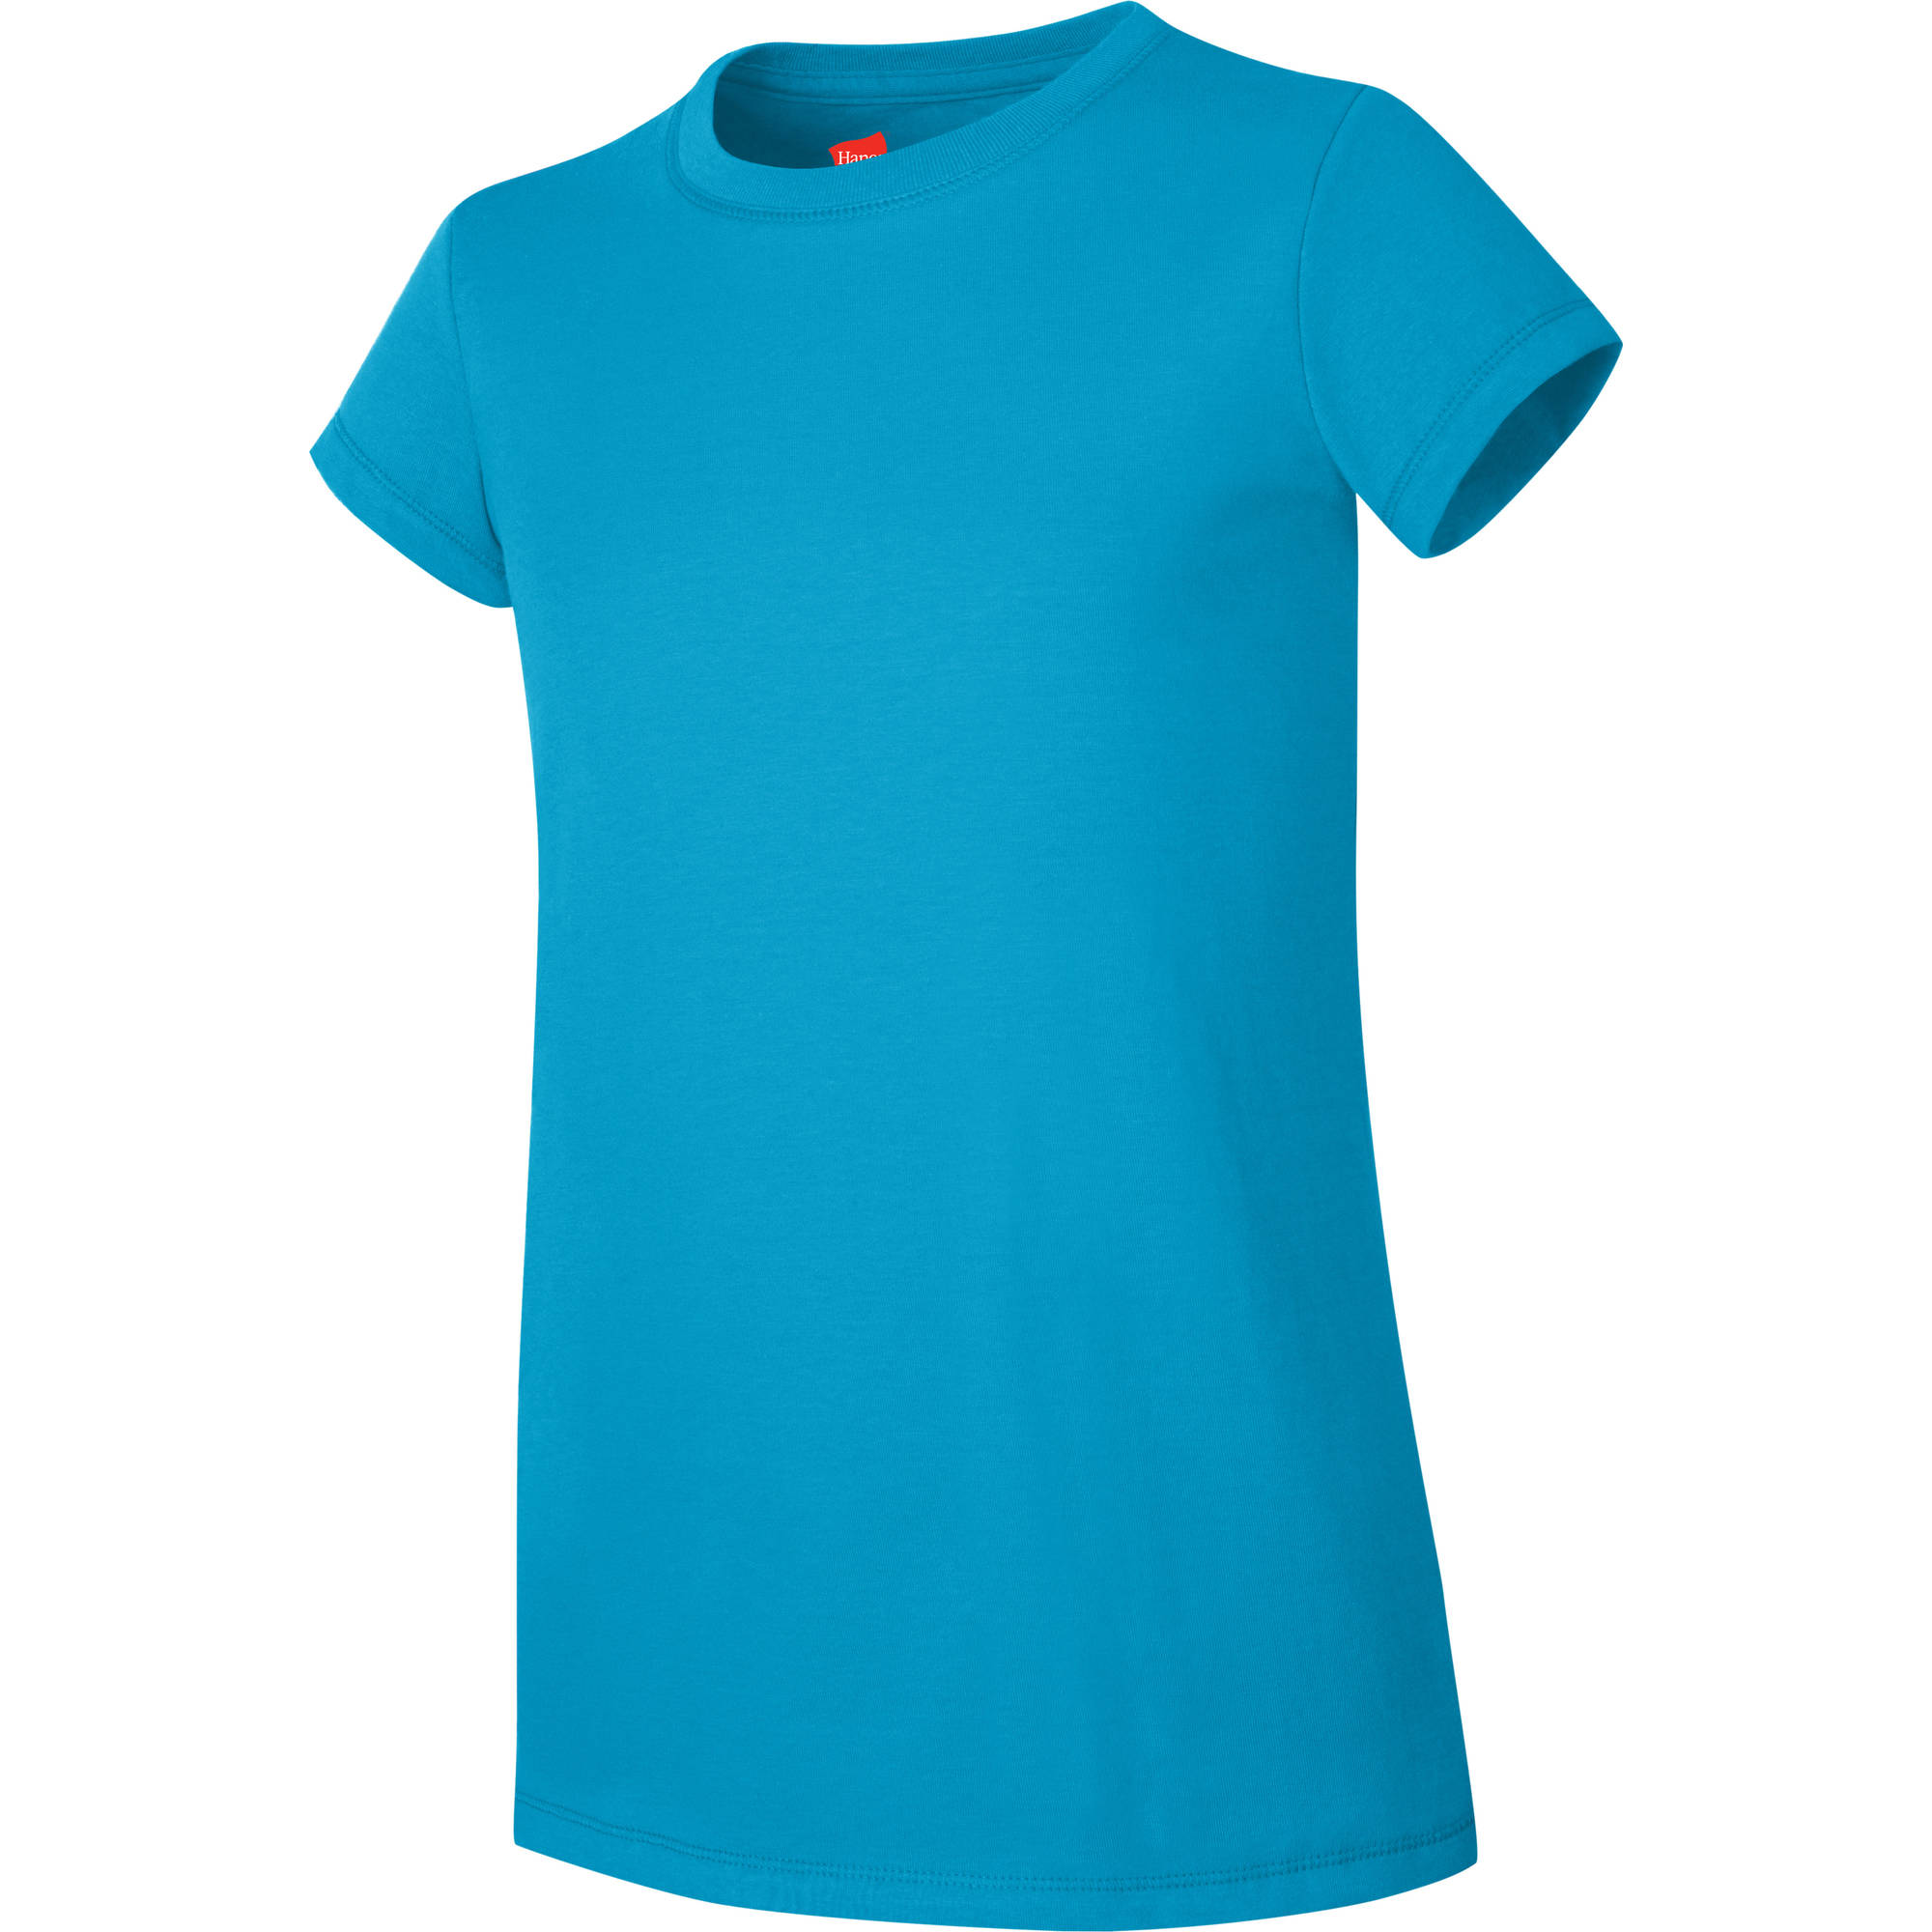 Hanes Girls' Short Sleeve T-shirt by Hanes